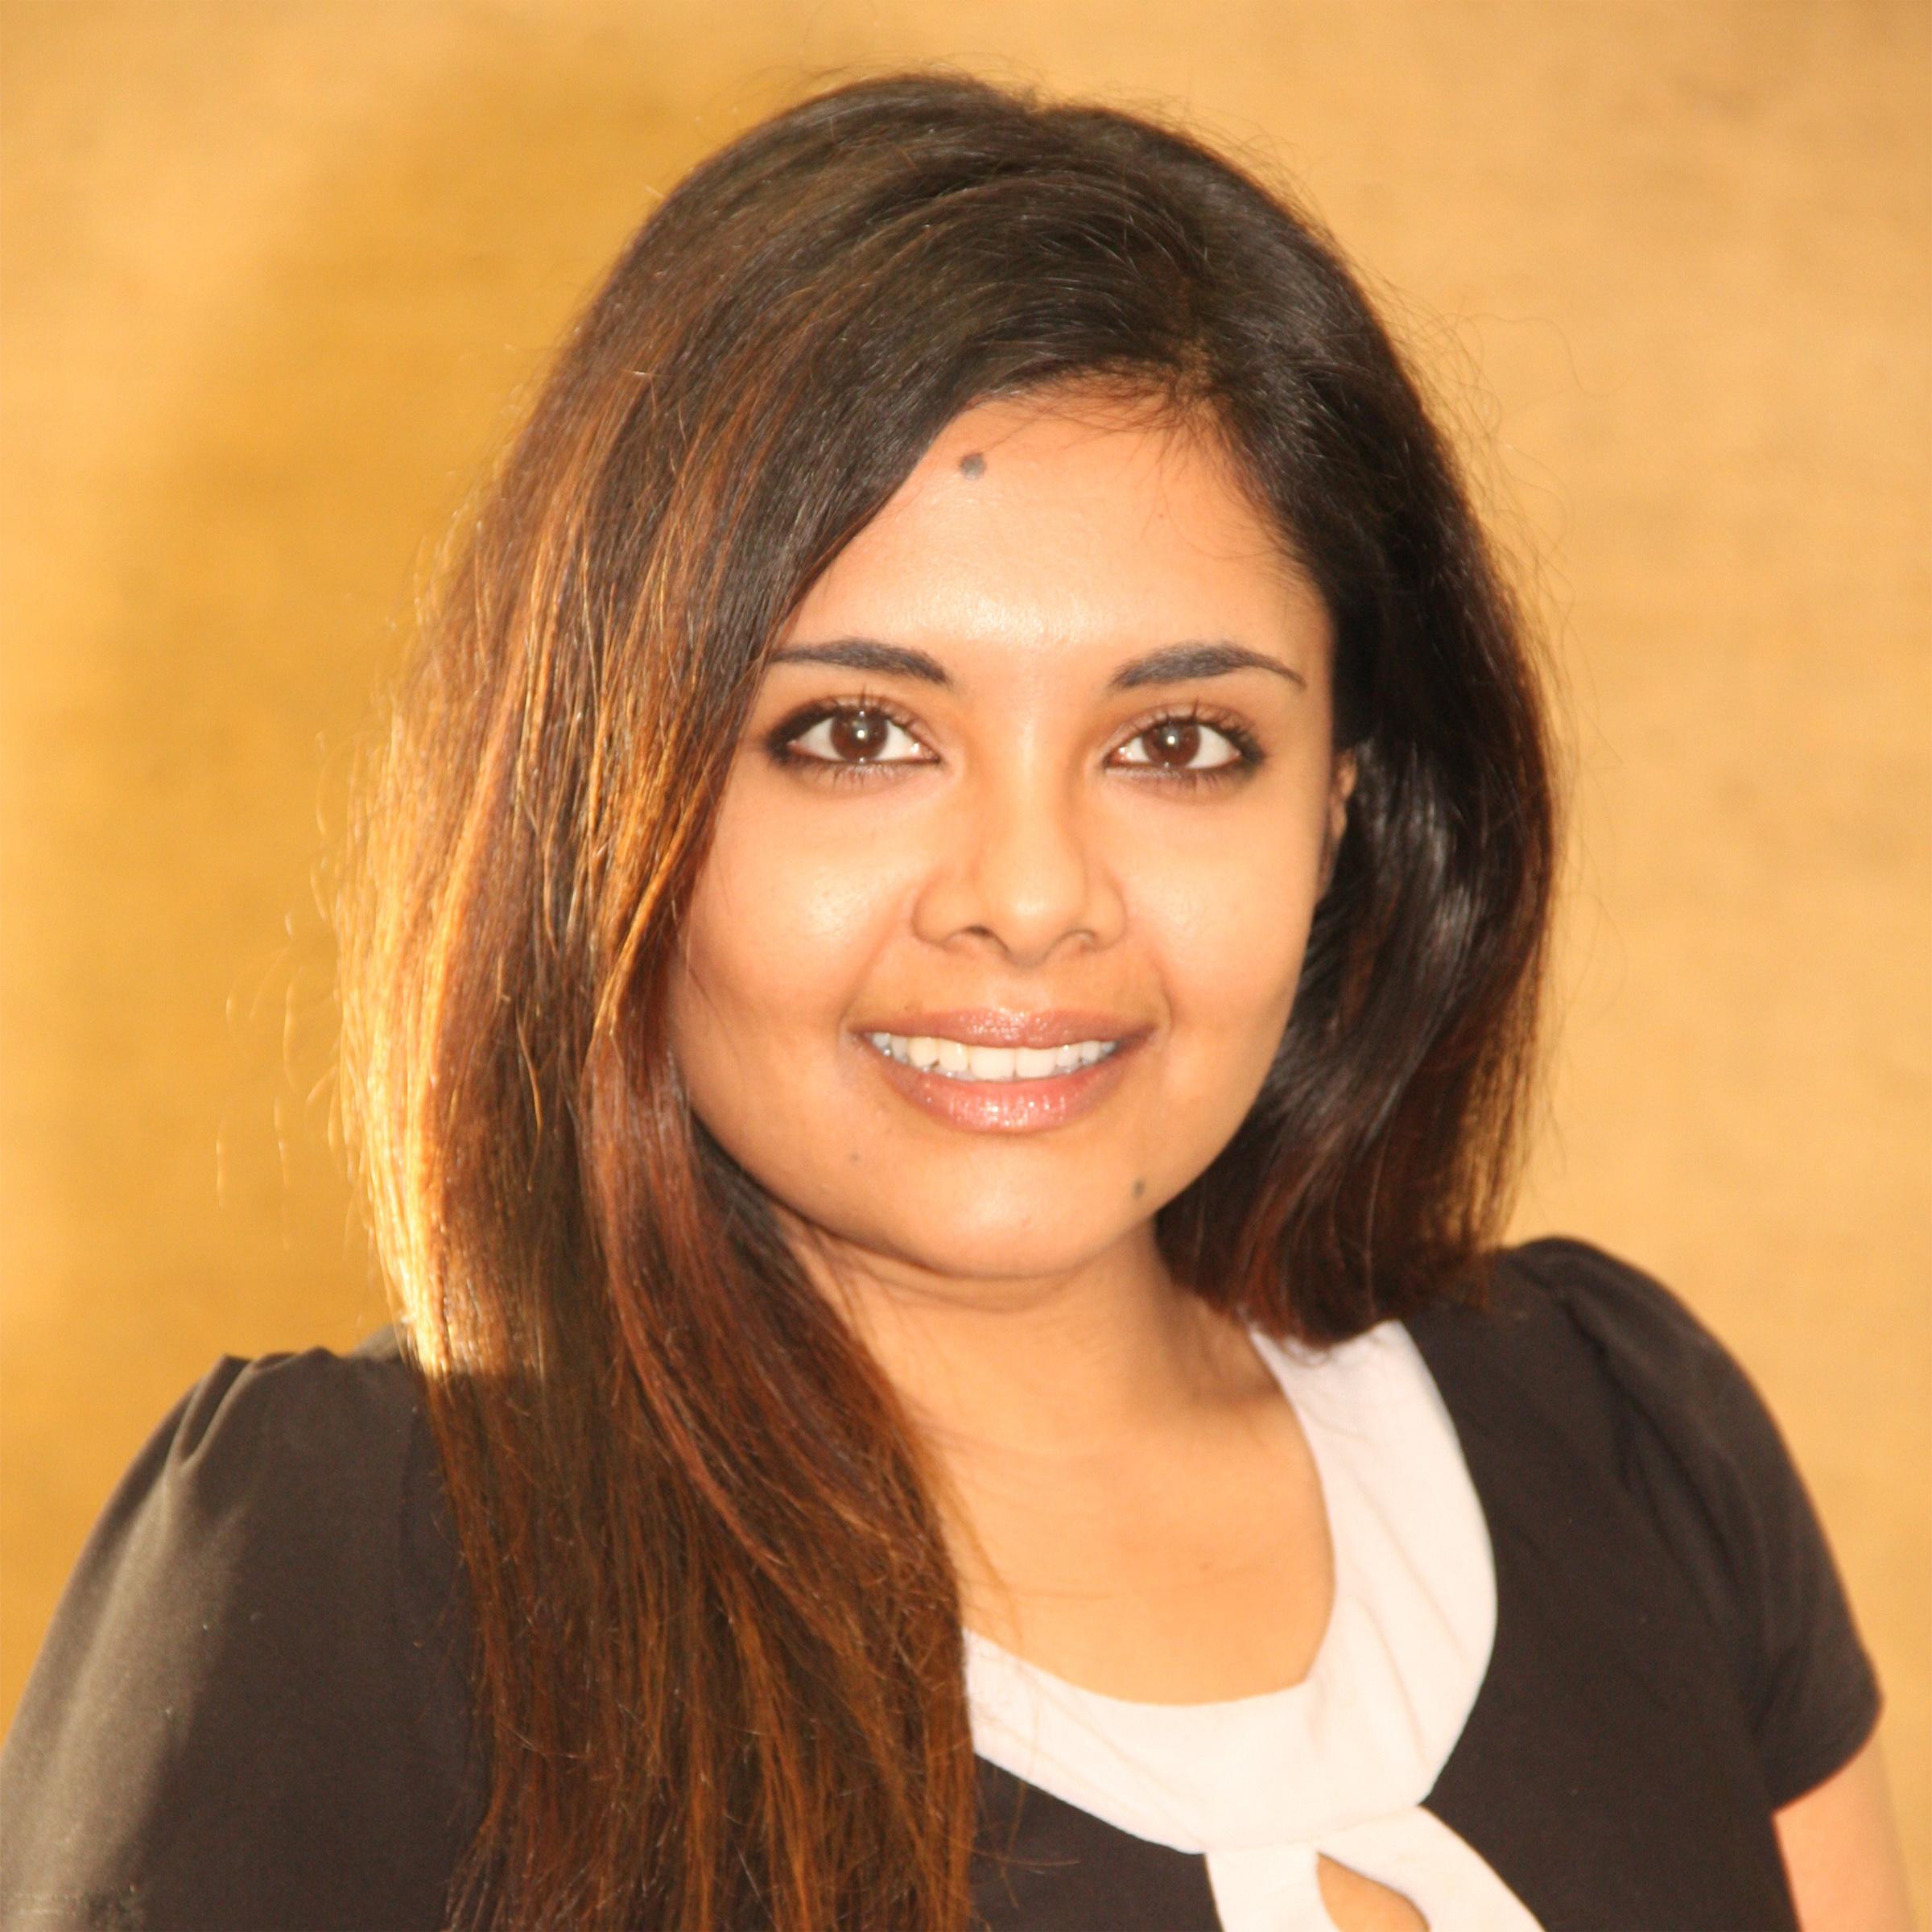 STOP-Board-Aparna-Anantharaman-Headshot.jpg